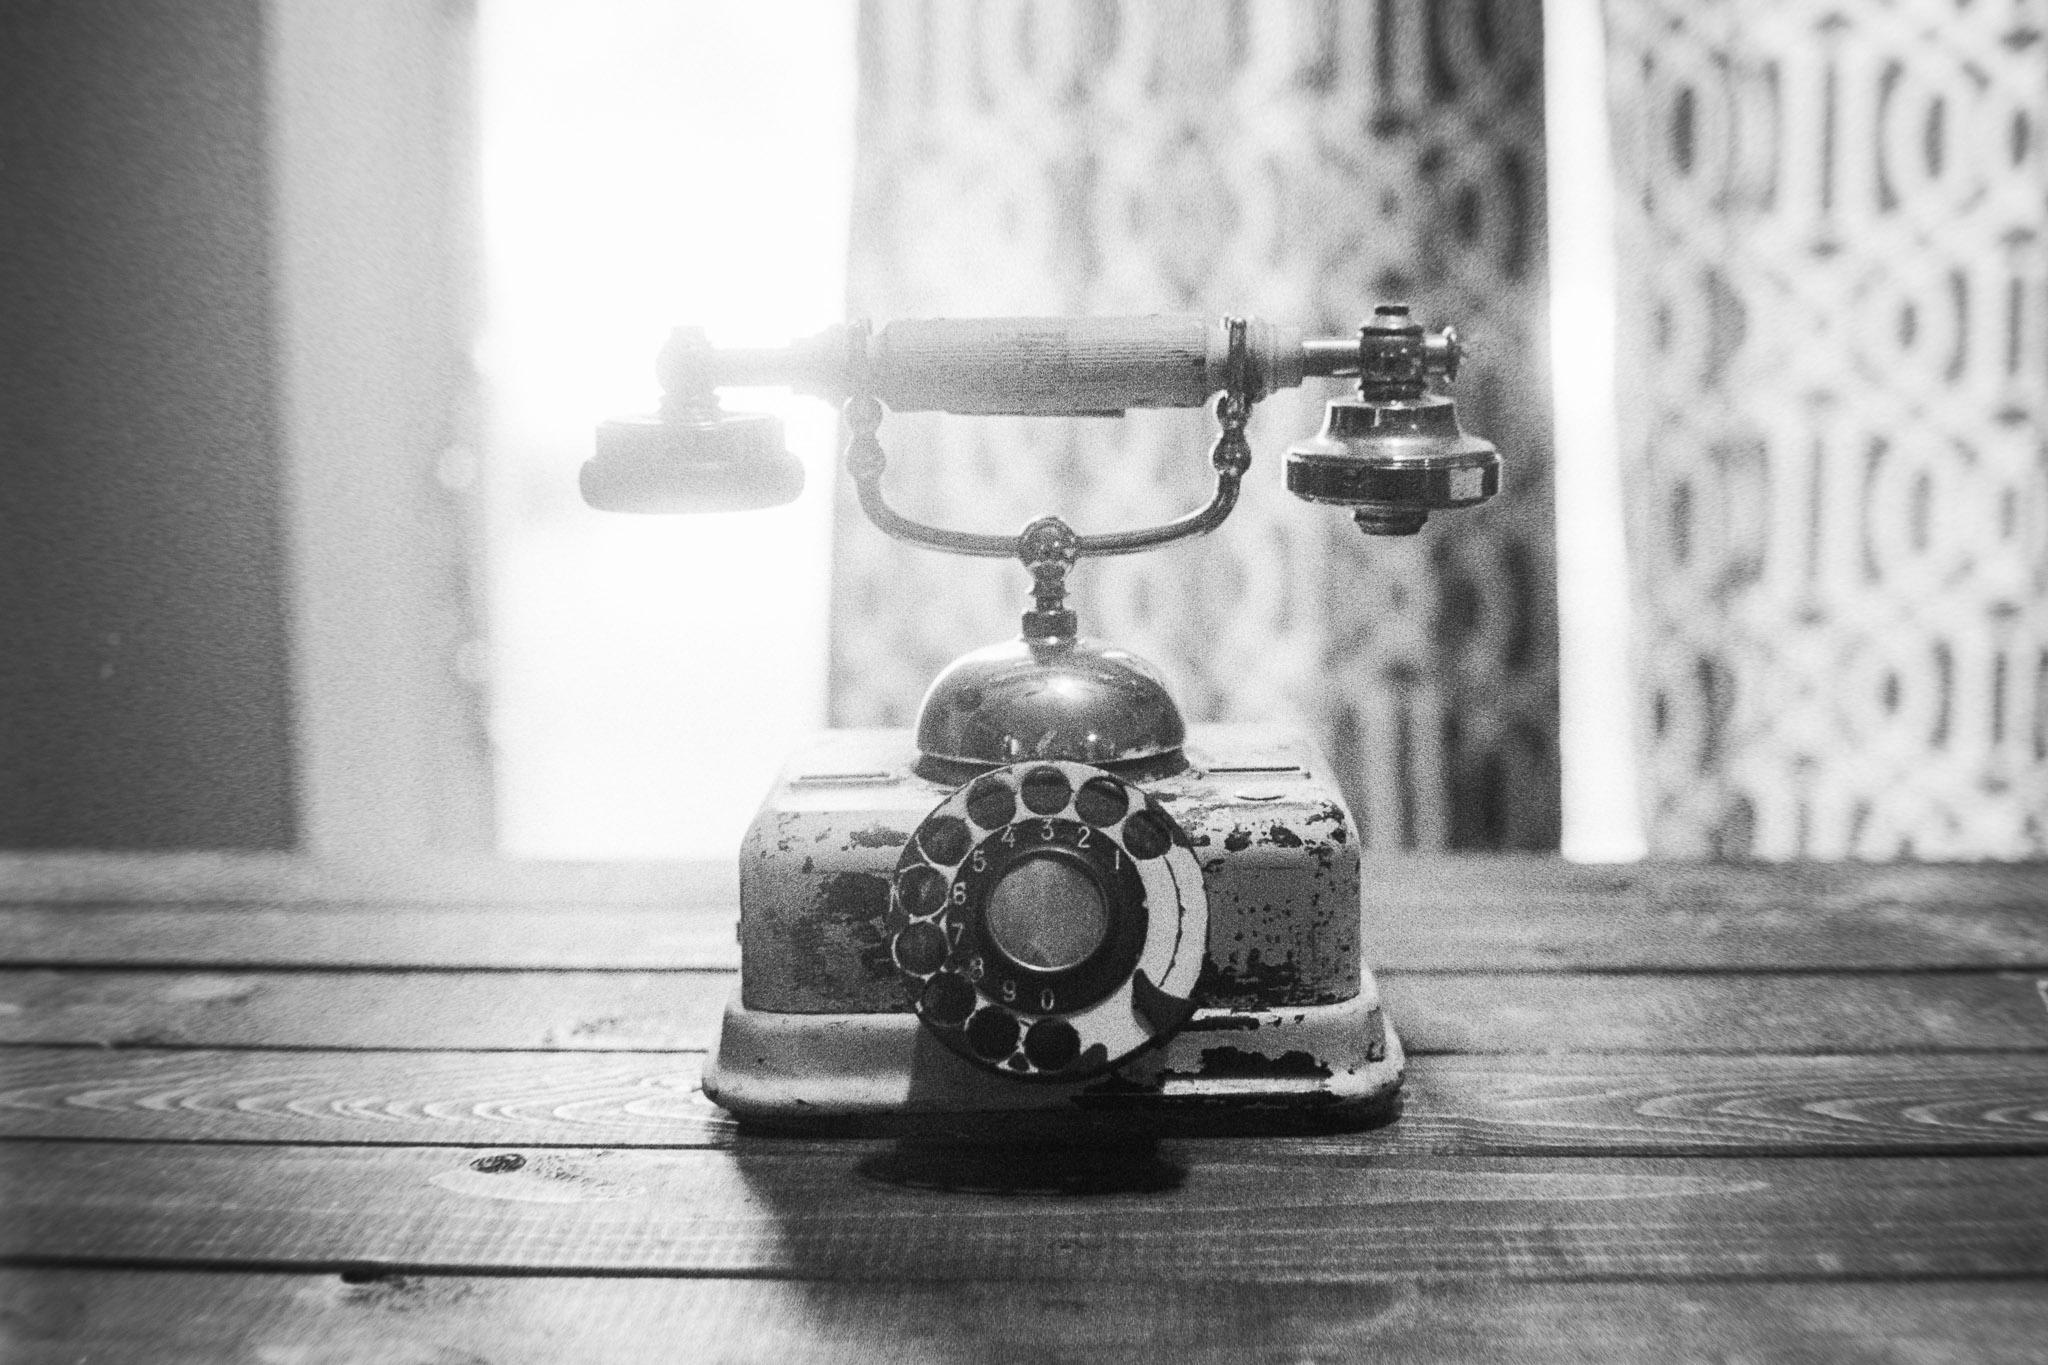 Camera:Minolta CLE  Lens: 40mm M Rokkor  Film: HP5+ plus rated at 800